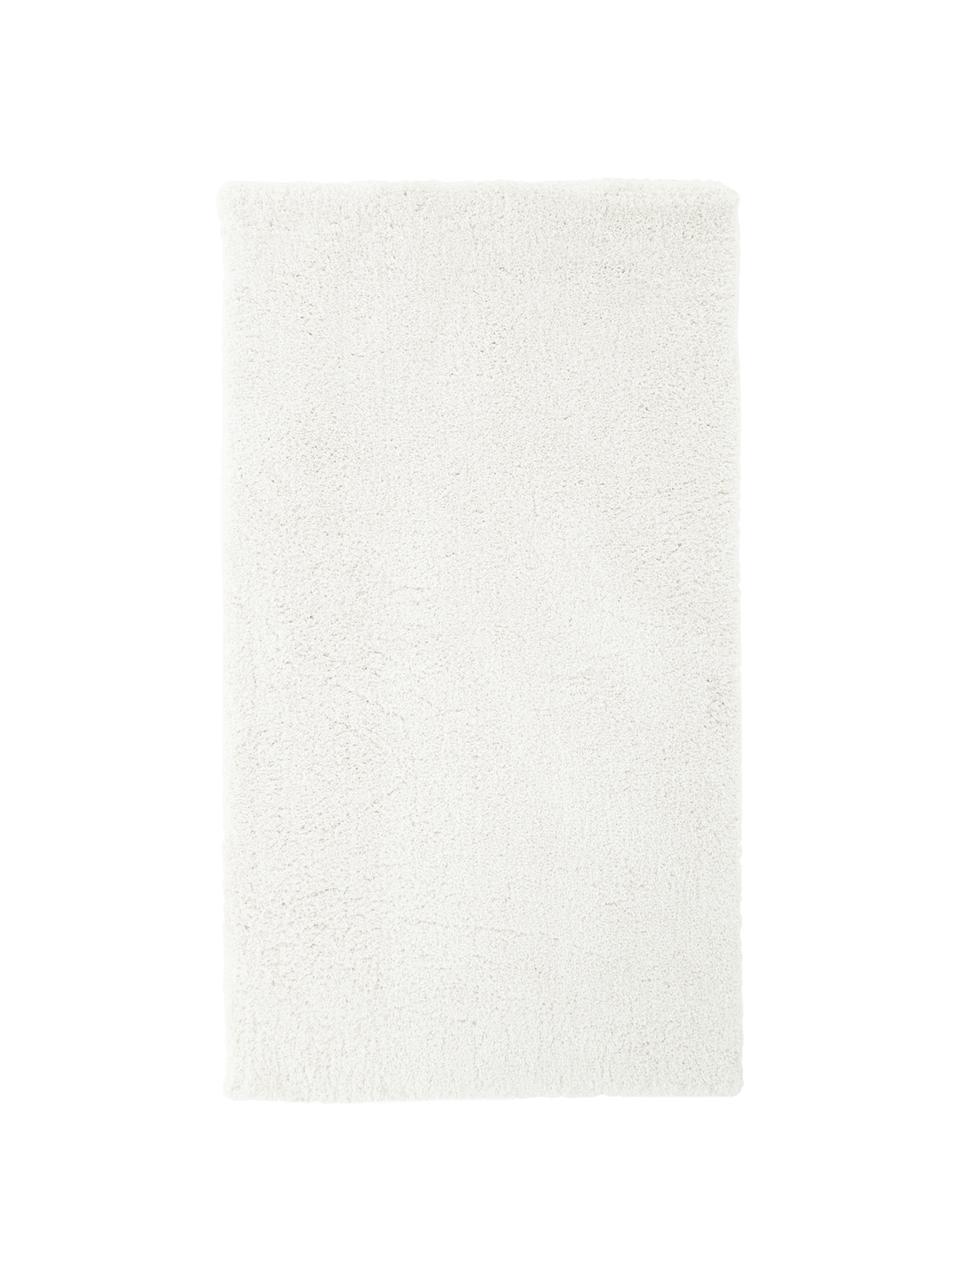 Tappeto morbido a pelo lungo color crema Leighton, Retro: 70% poliestere, 30% coton, Crema, Larg. 300 x Lung. 400 cm (taglia XL)